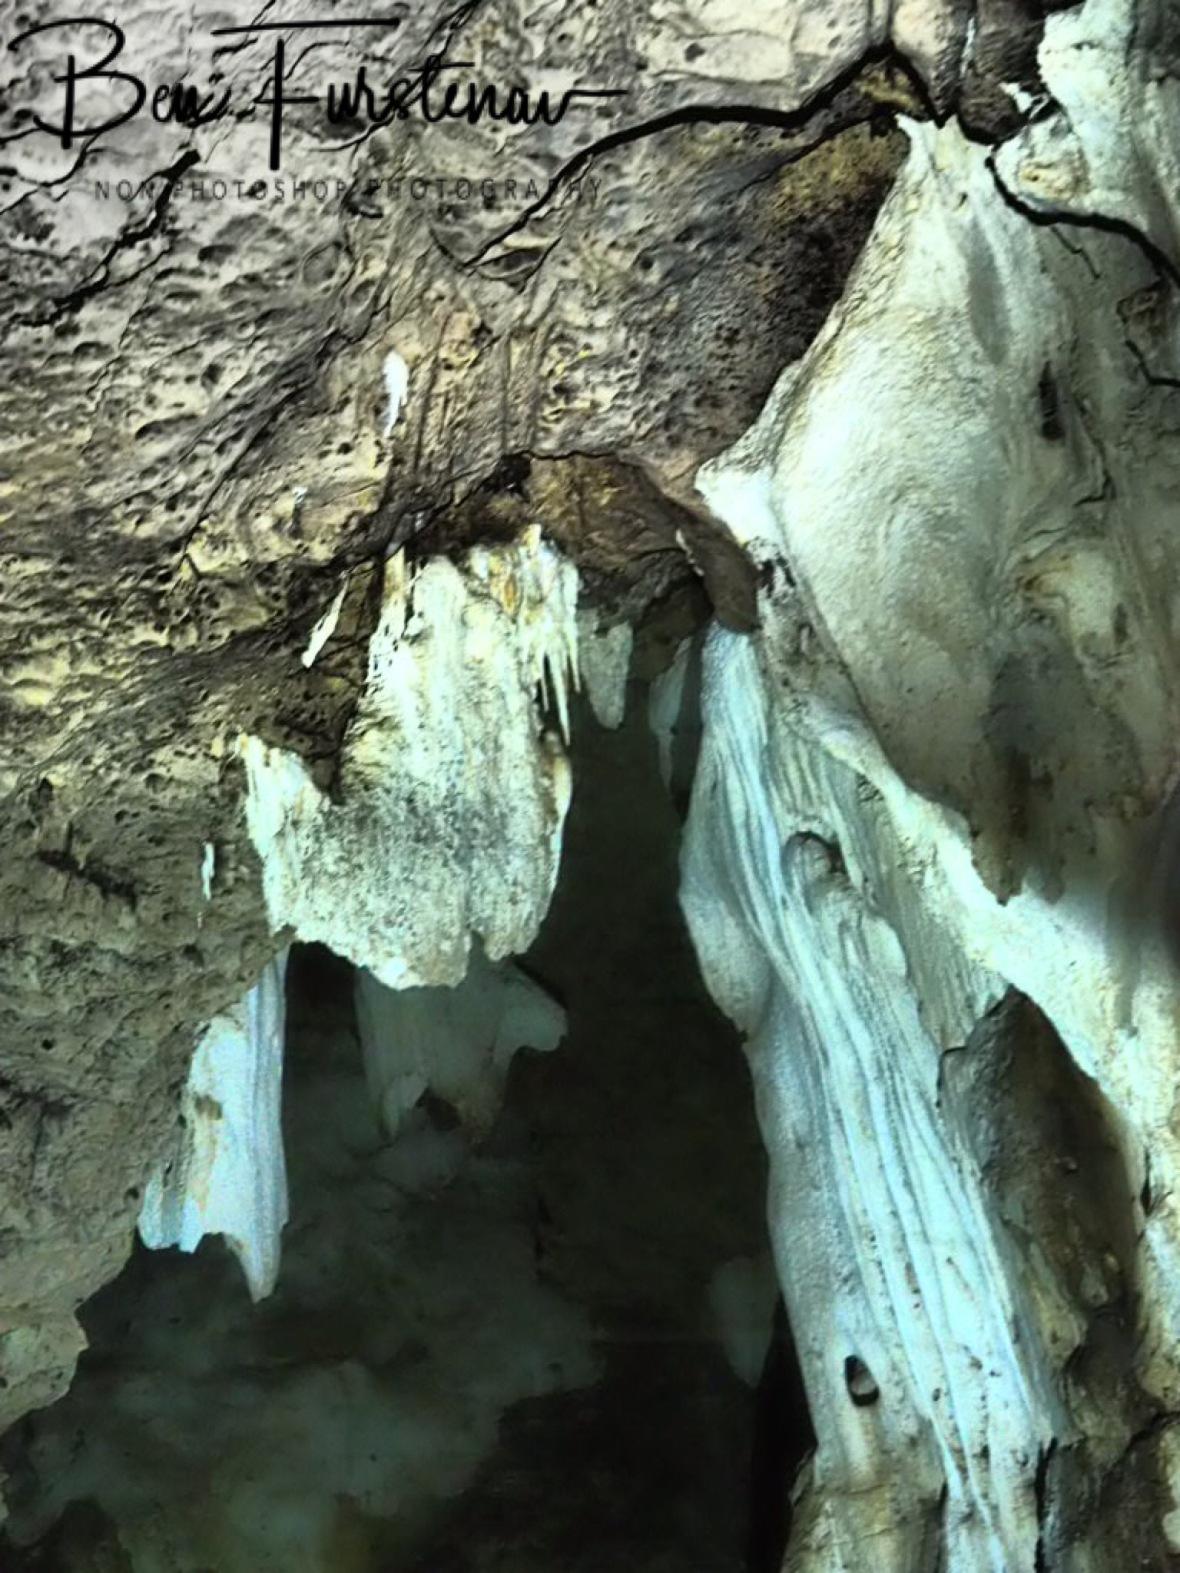 Stalagmites at Drotsky Caves, Kalahari desert, Botswana